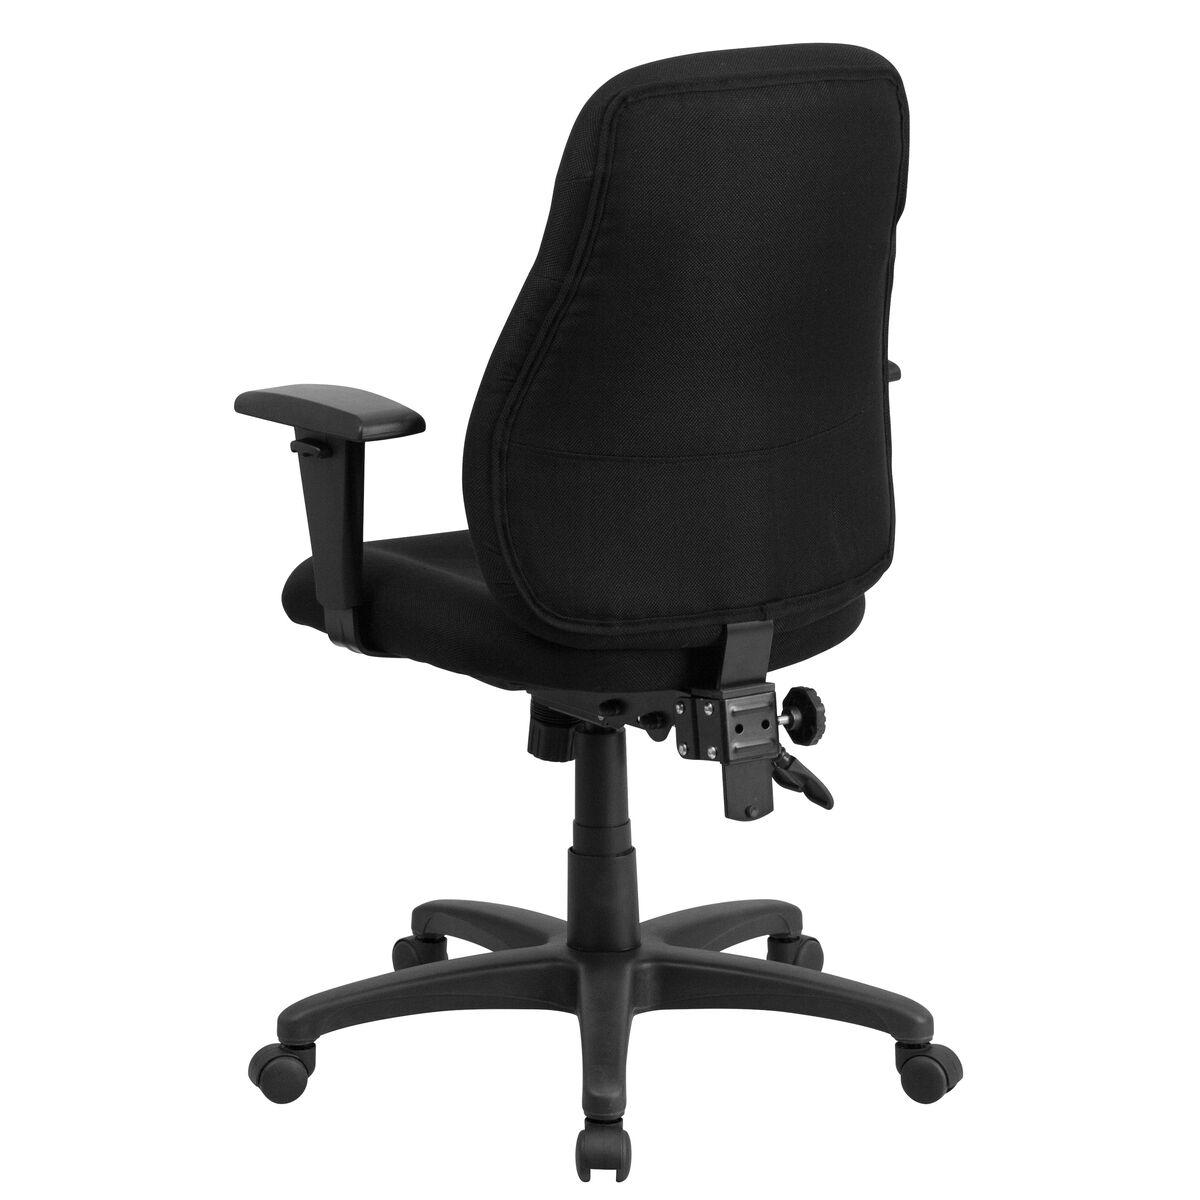 black mid back task chair bt 90297m a gg bizchair com